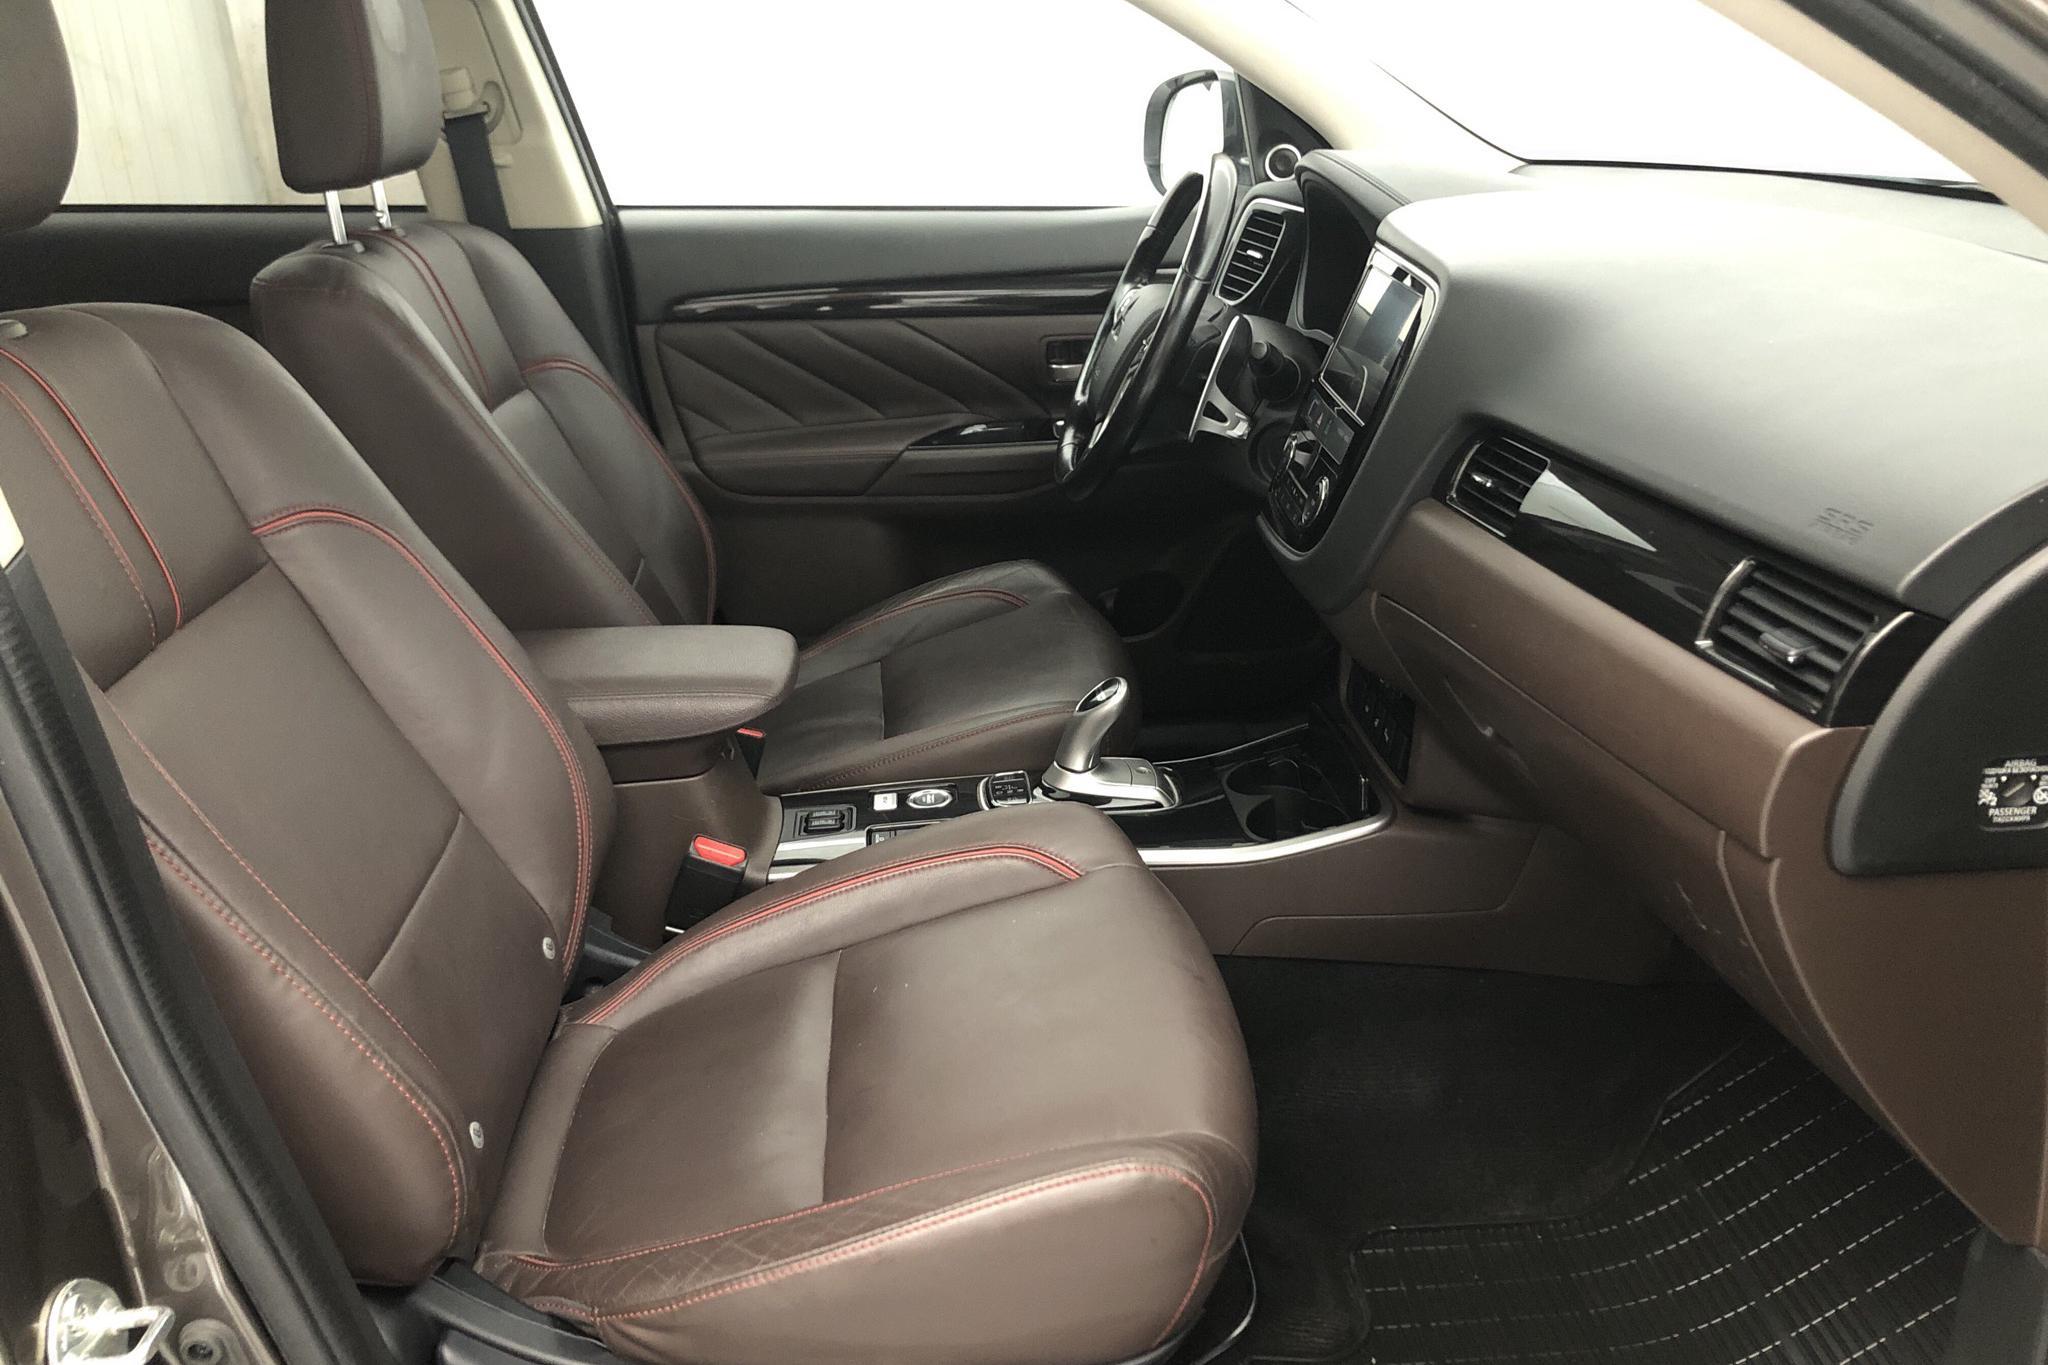 Mitsubishi Outlander 2.0 Plug-in Hybrid 4WD (121hk) - 6 481 mil - Automat - brun - 2017